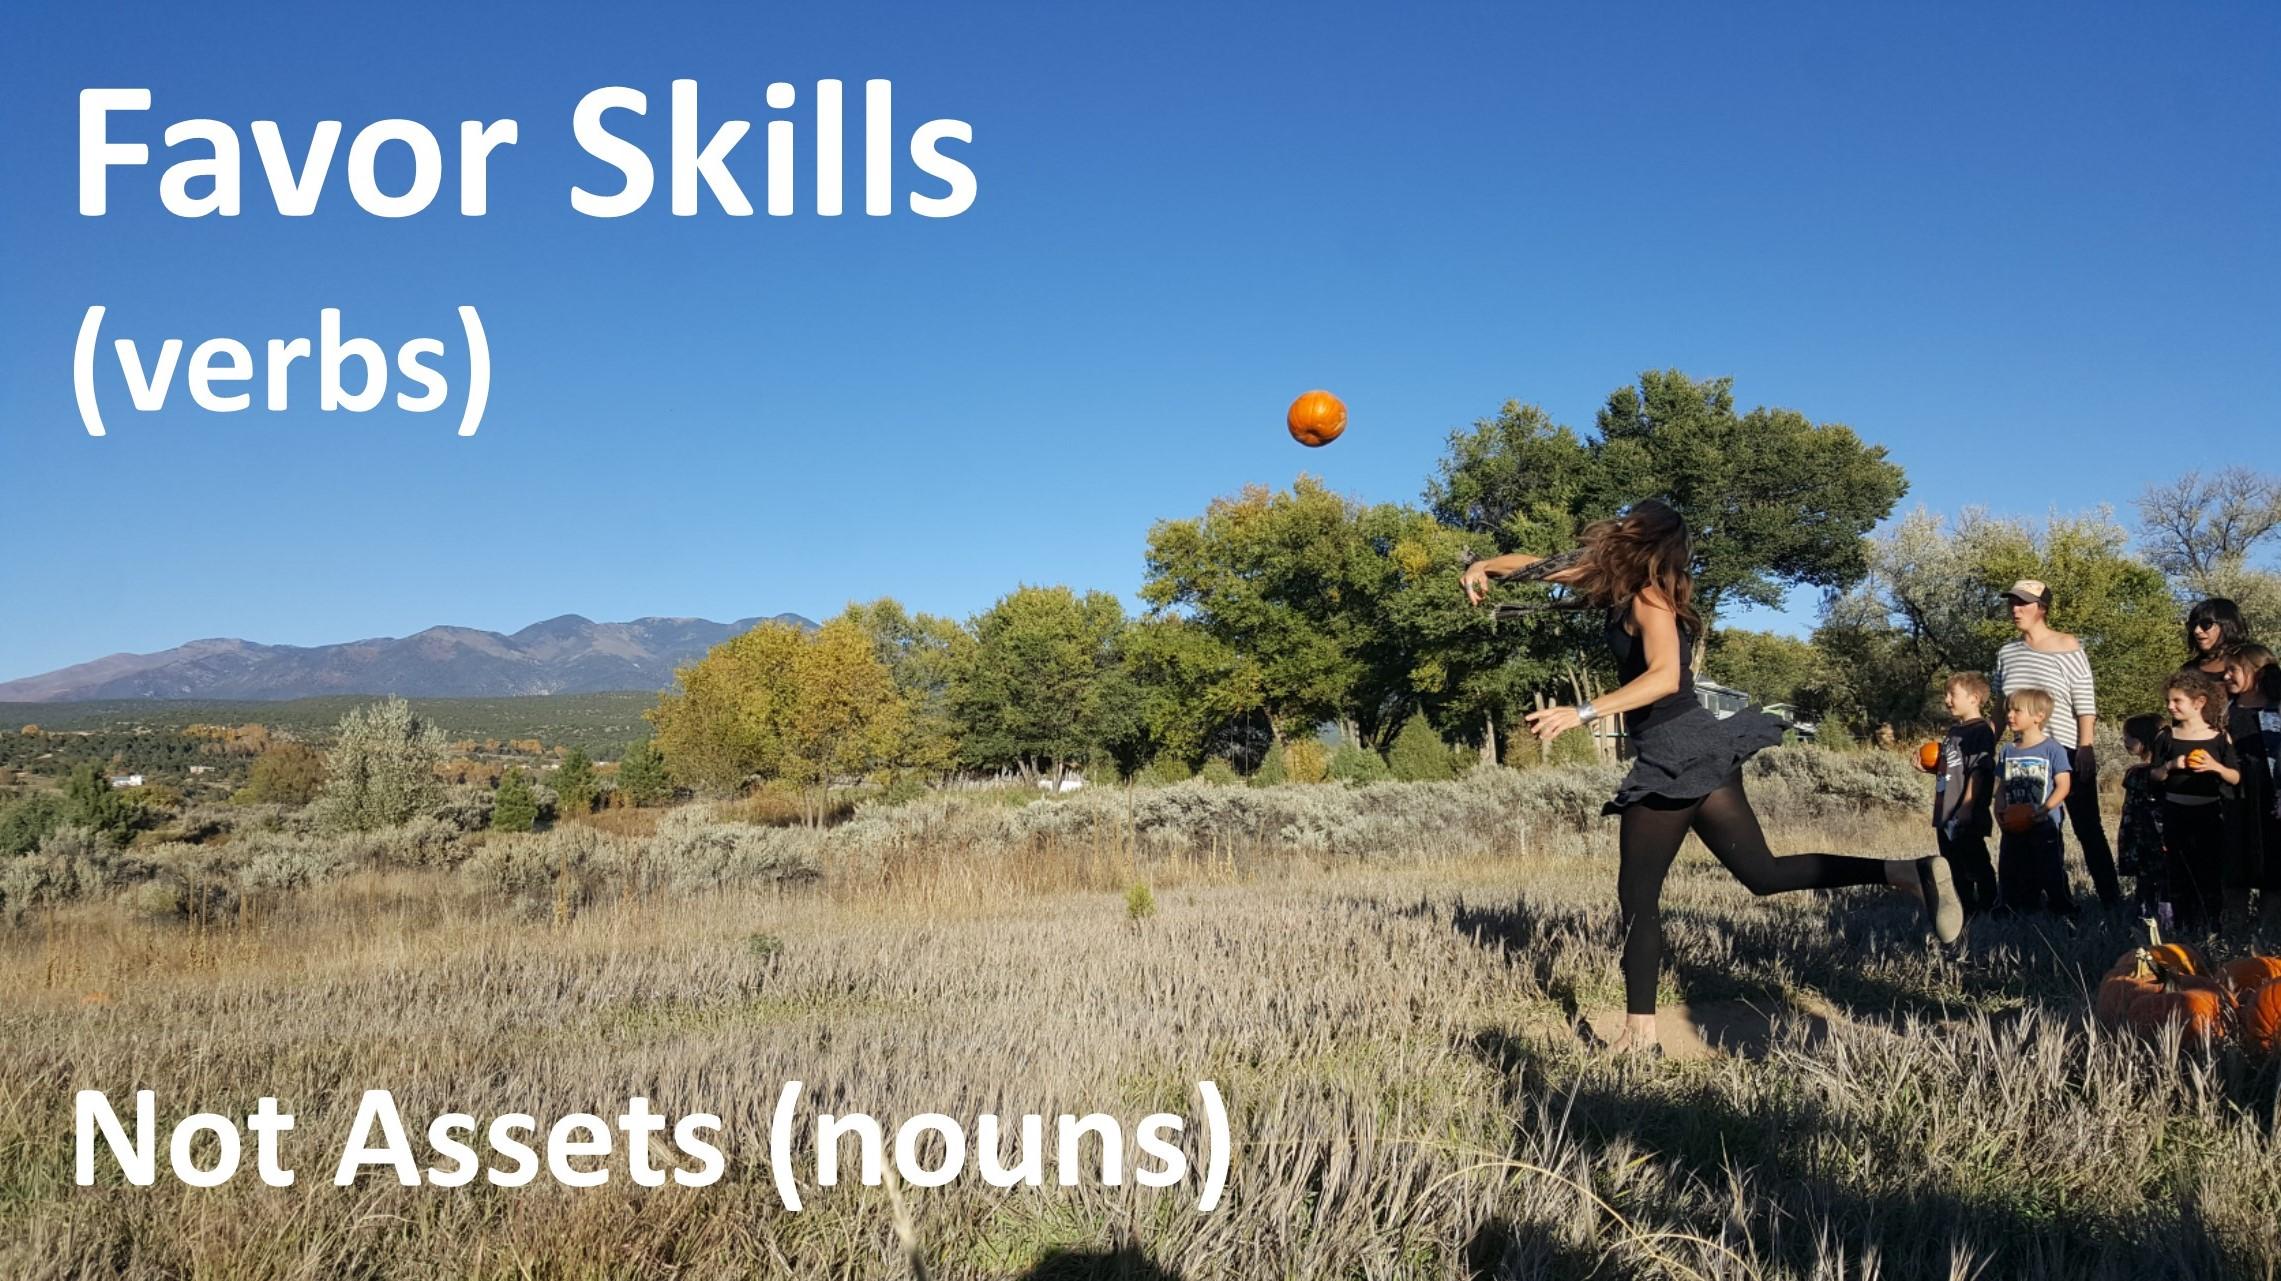 Favor Skills Not Assets.jpg